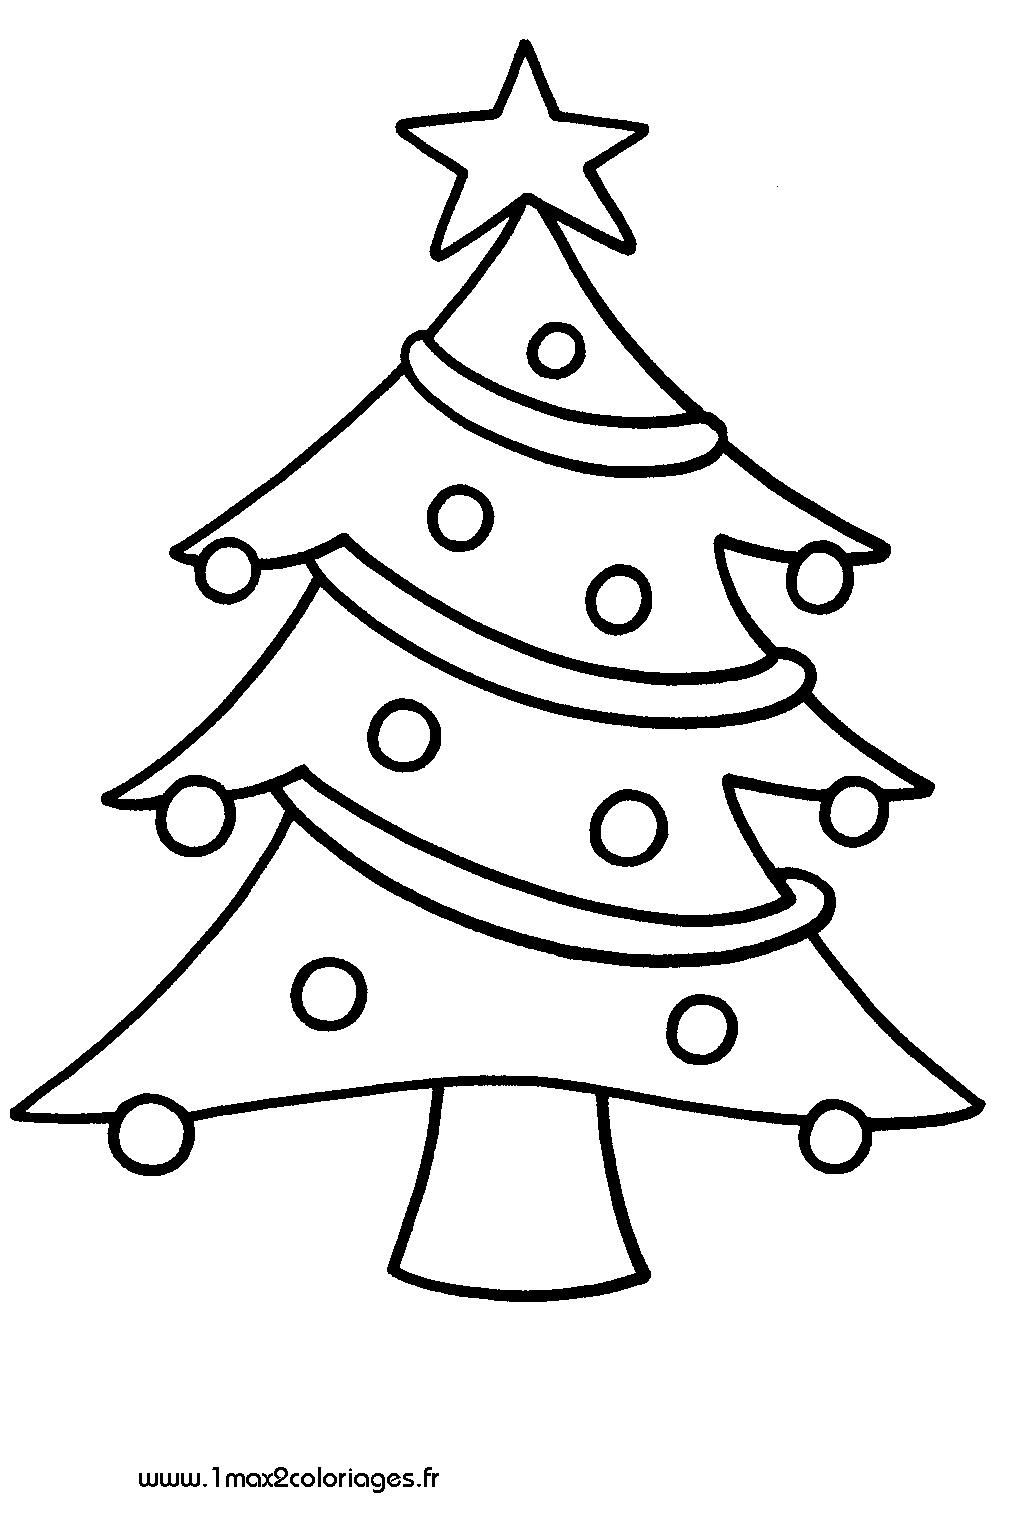 Coloriage204: Sapin De Noel Coloriage A Imprimer tout Coloriage De Sapin De Noel A Imprimer Gratuit